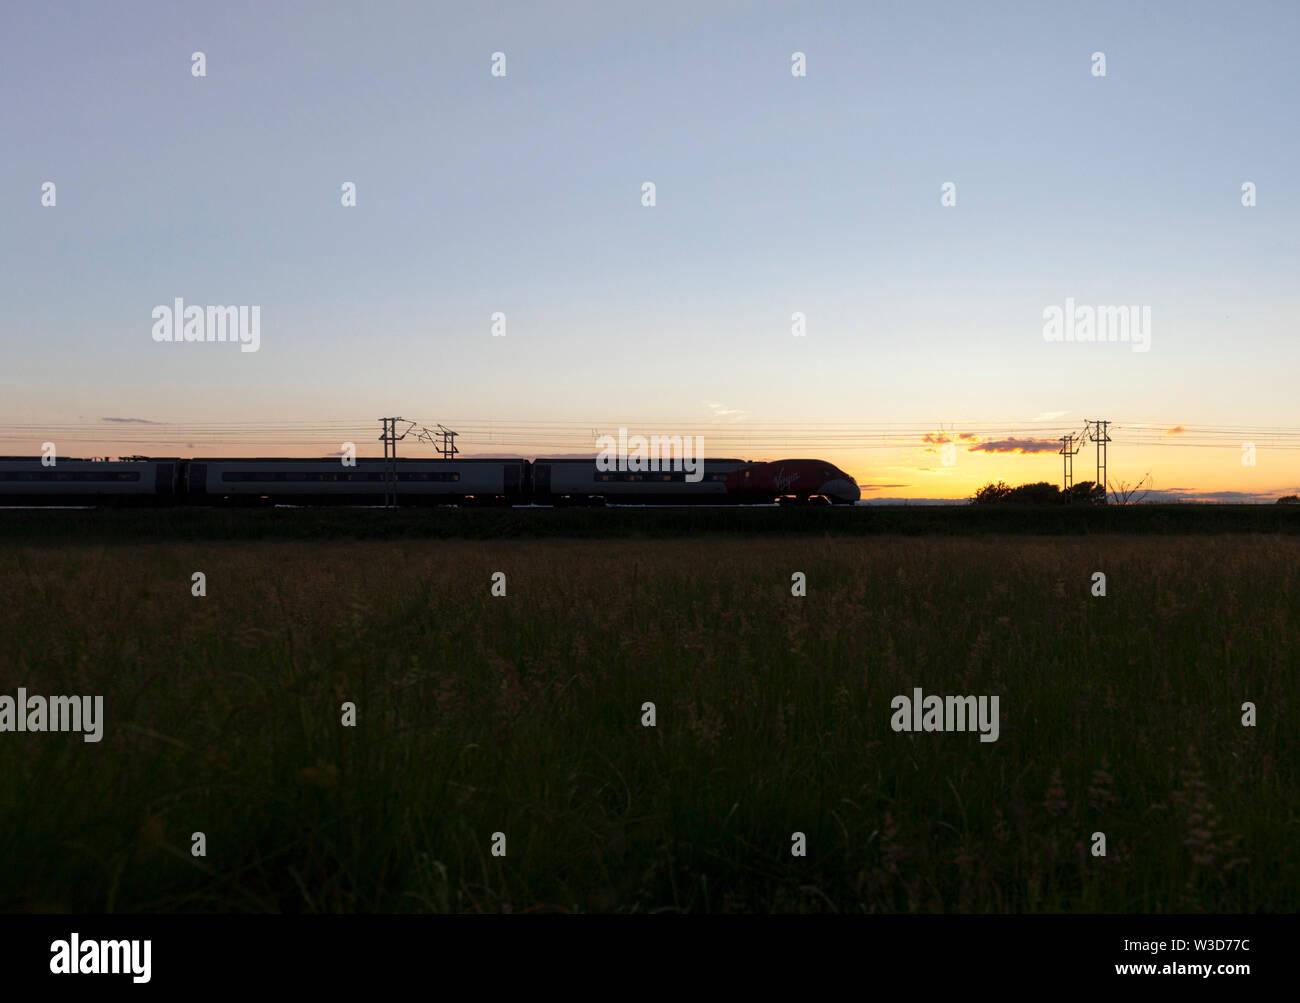 25/06/2019 Bolton Le Sands (south of Carnforth) 390xxx 1743 London Euston to Glasgow Central via Birmingham - Stock Image